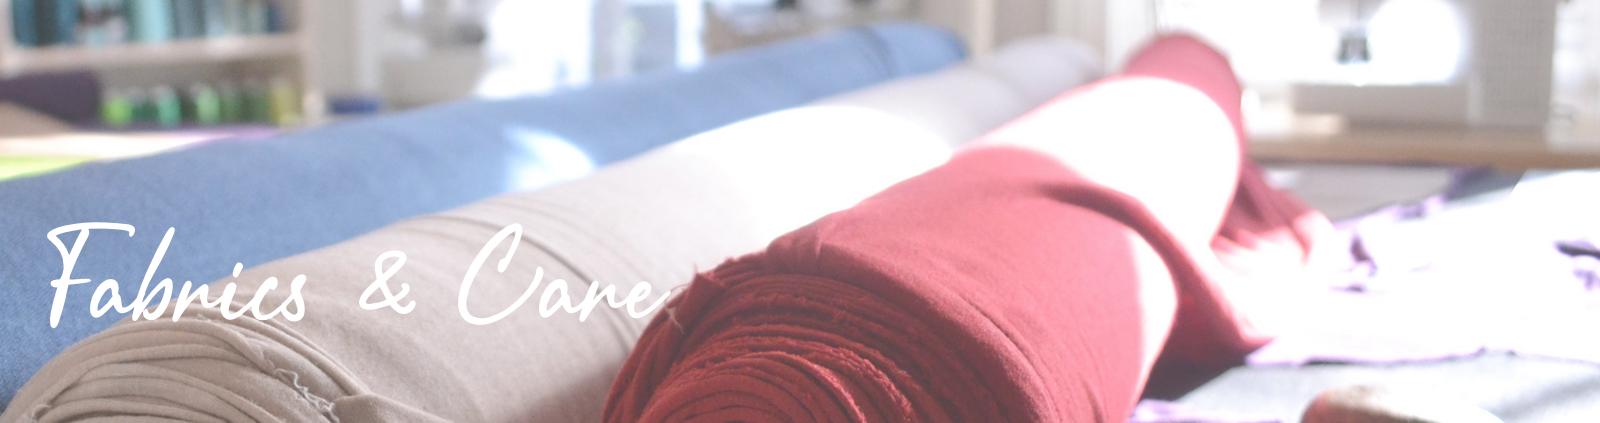 fabrics-and-care5.jpg